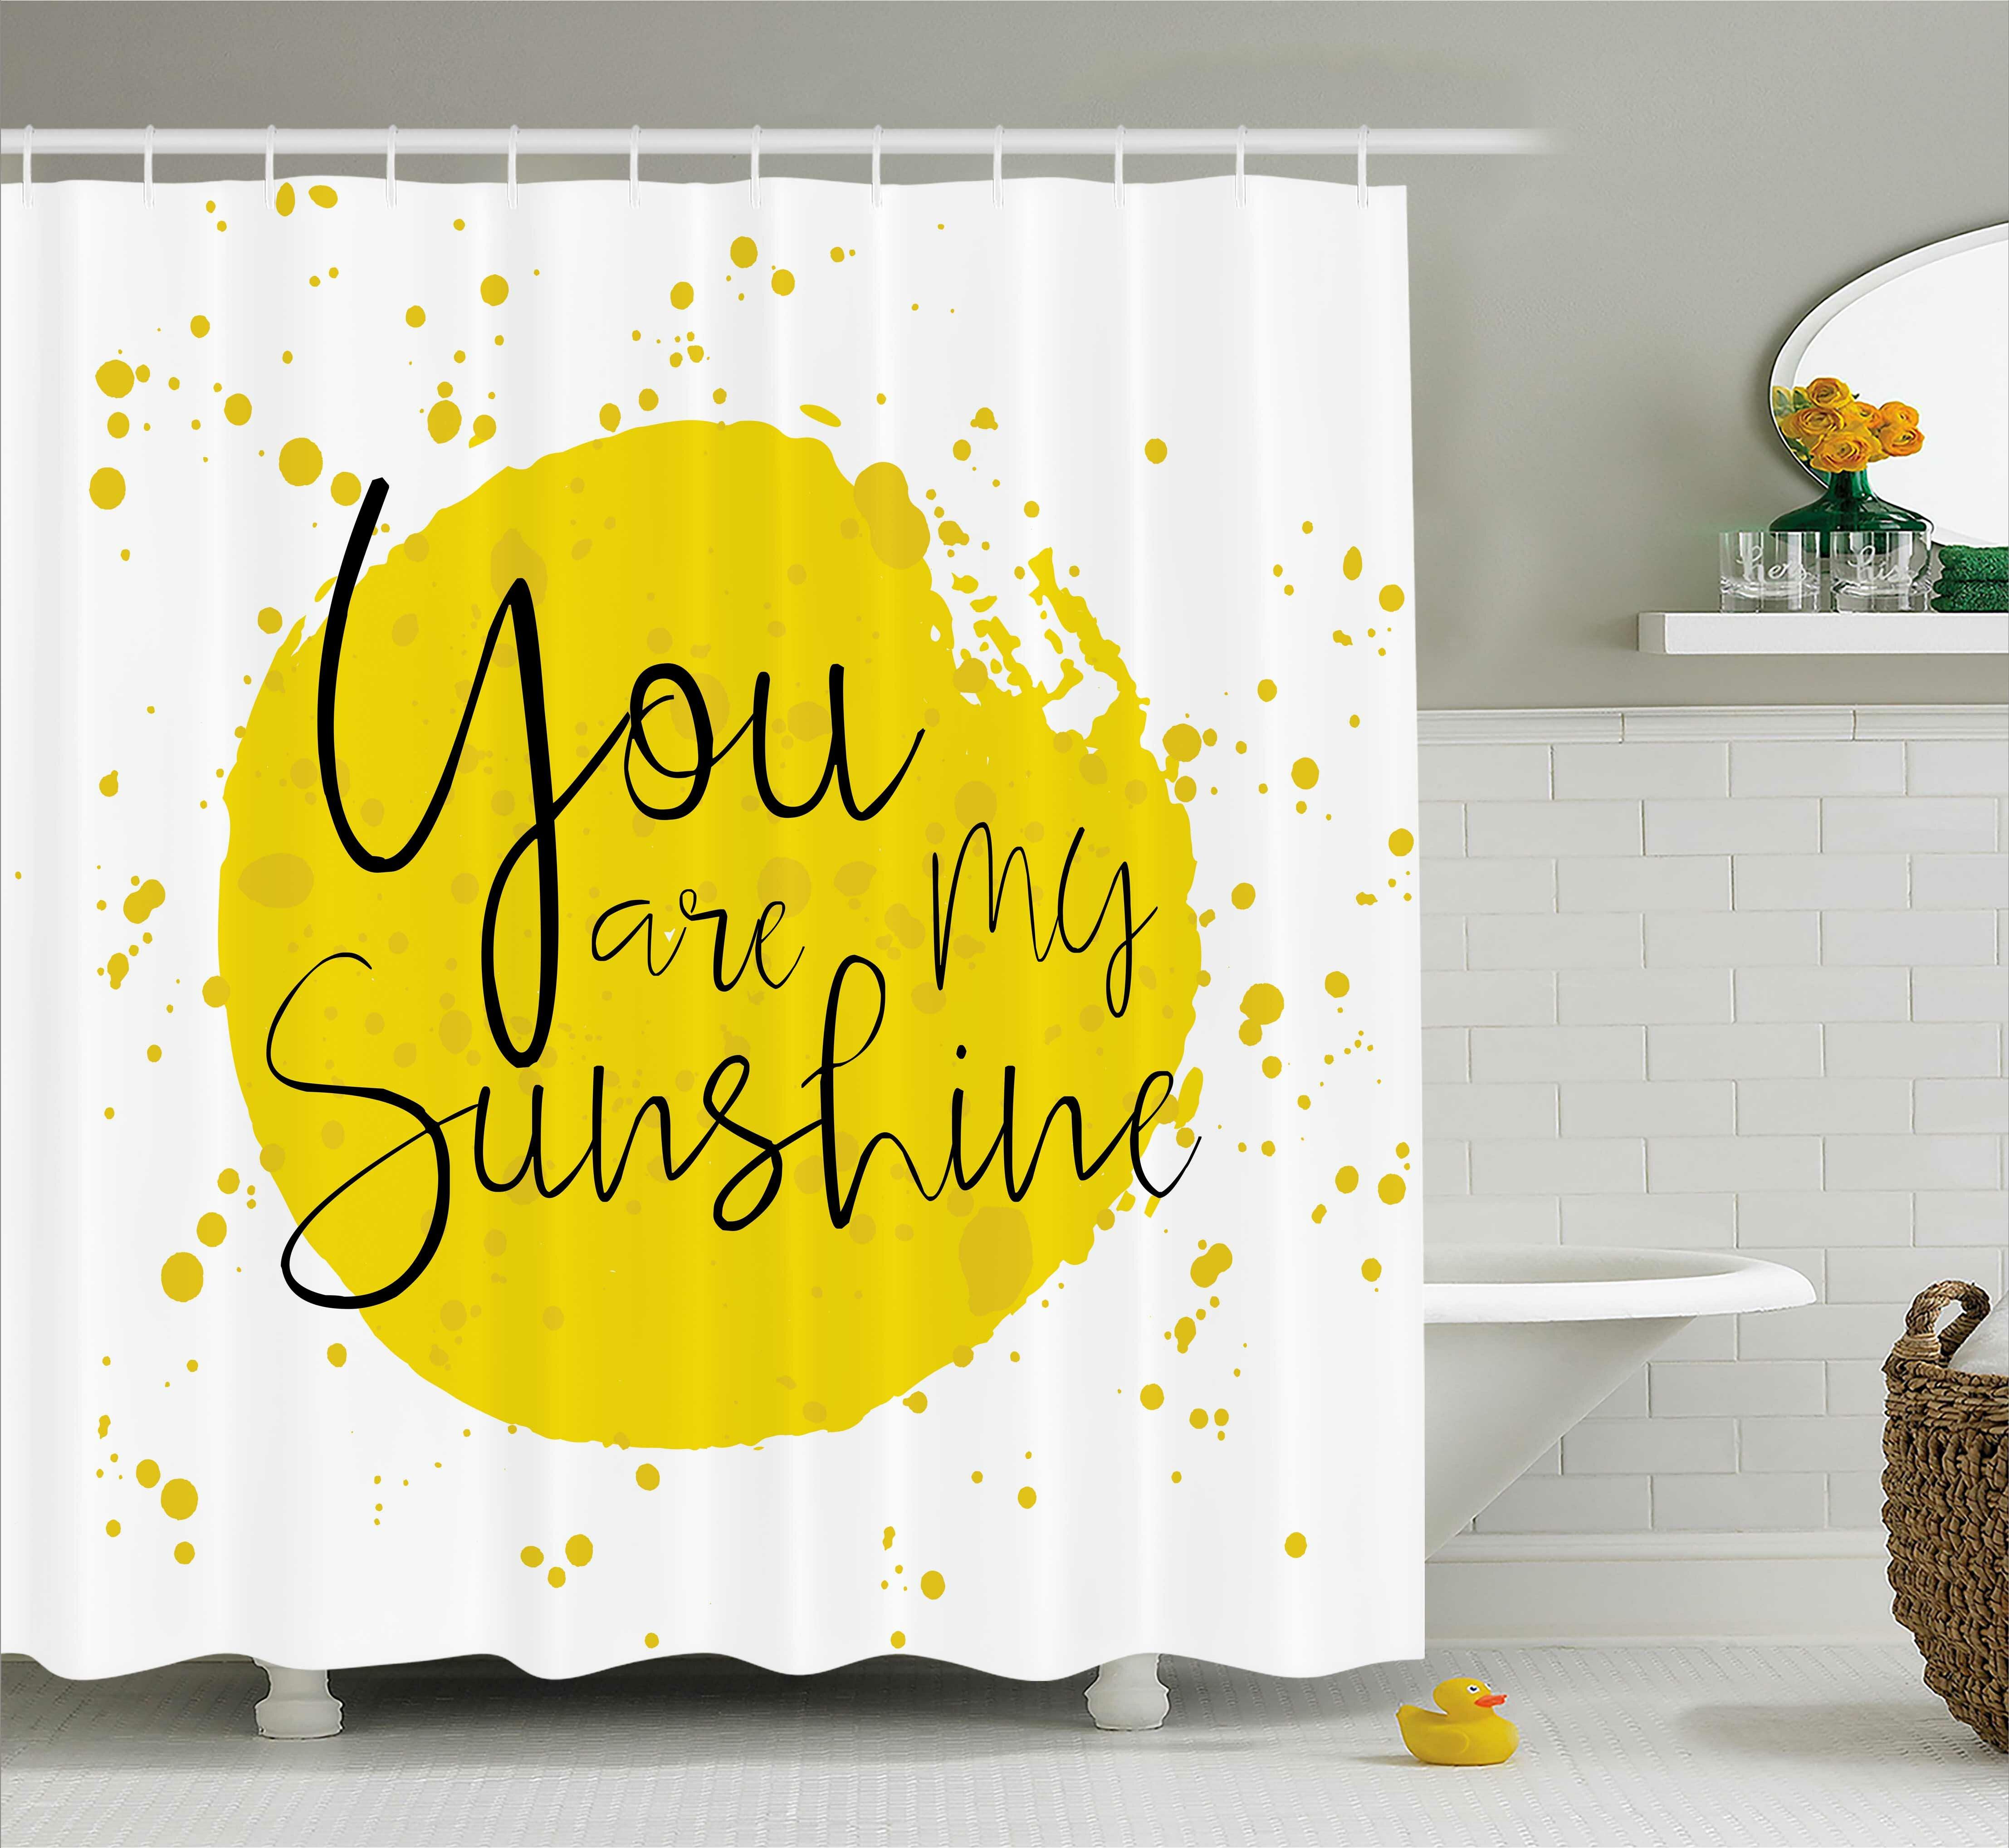 East Urban Home Circular Splash Quotes Decor Shower Curtain